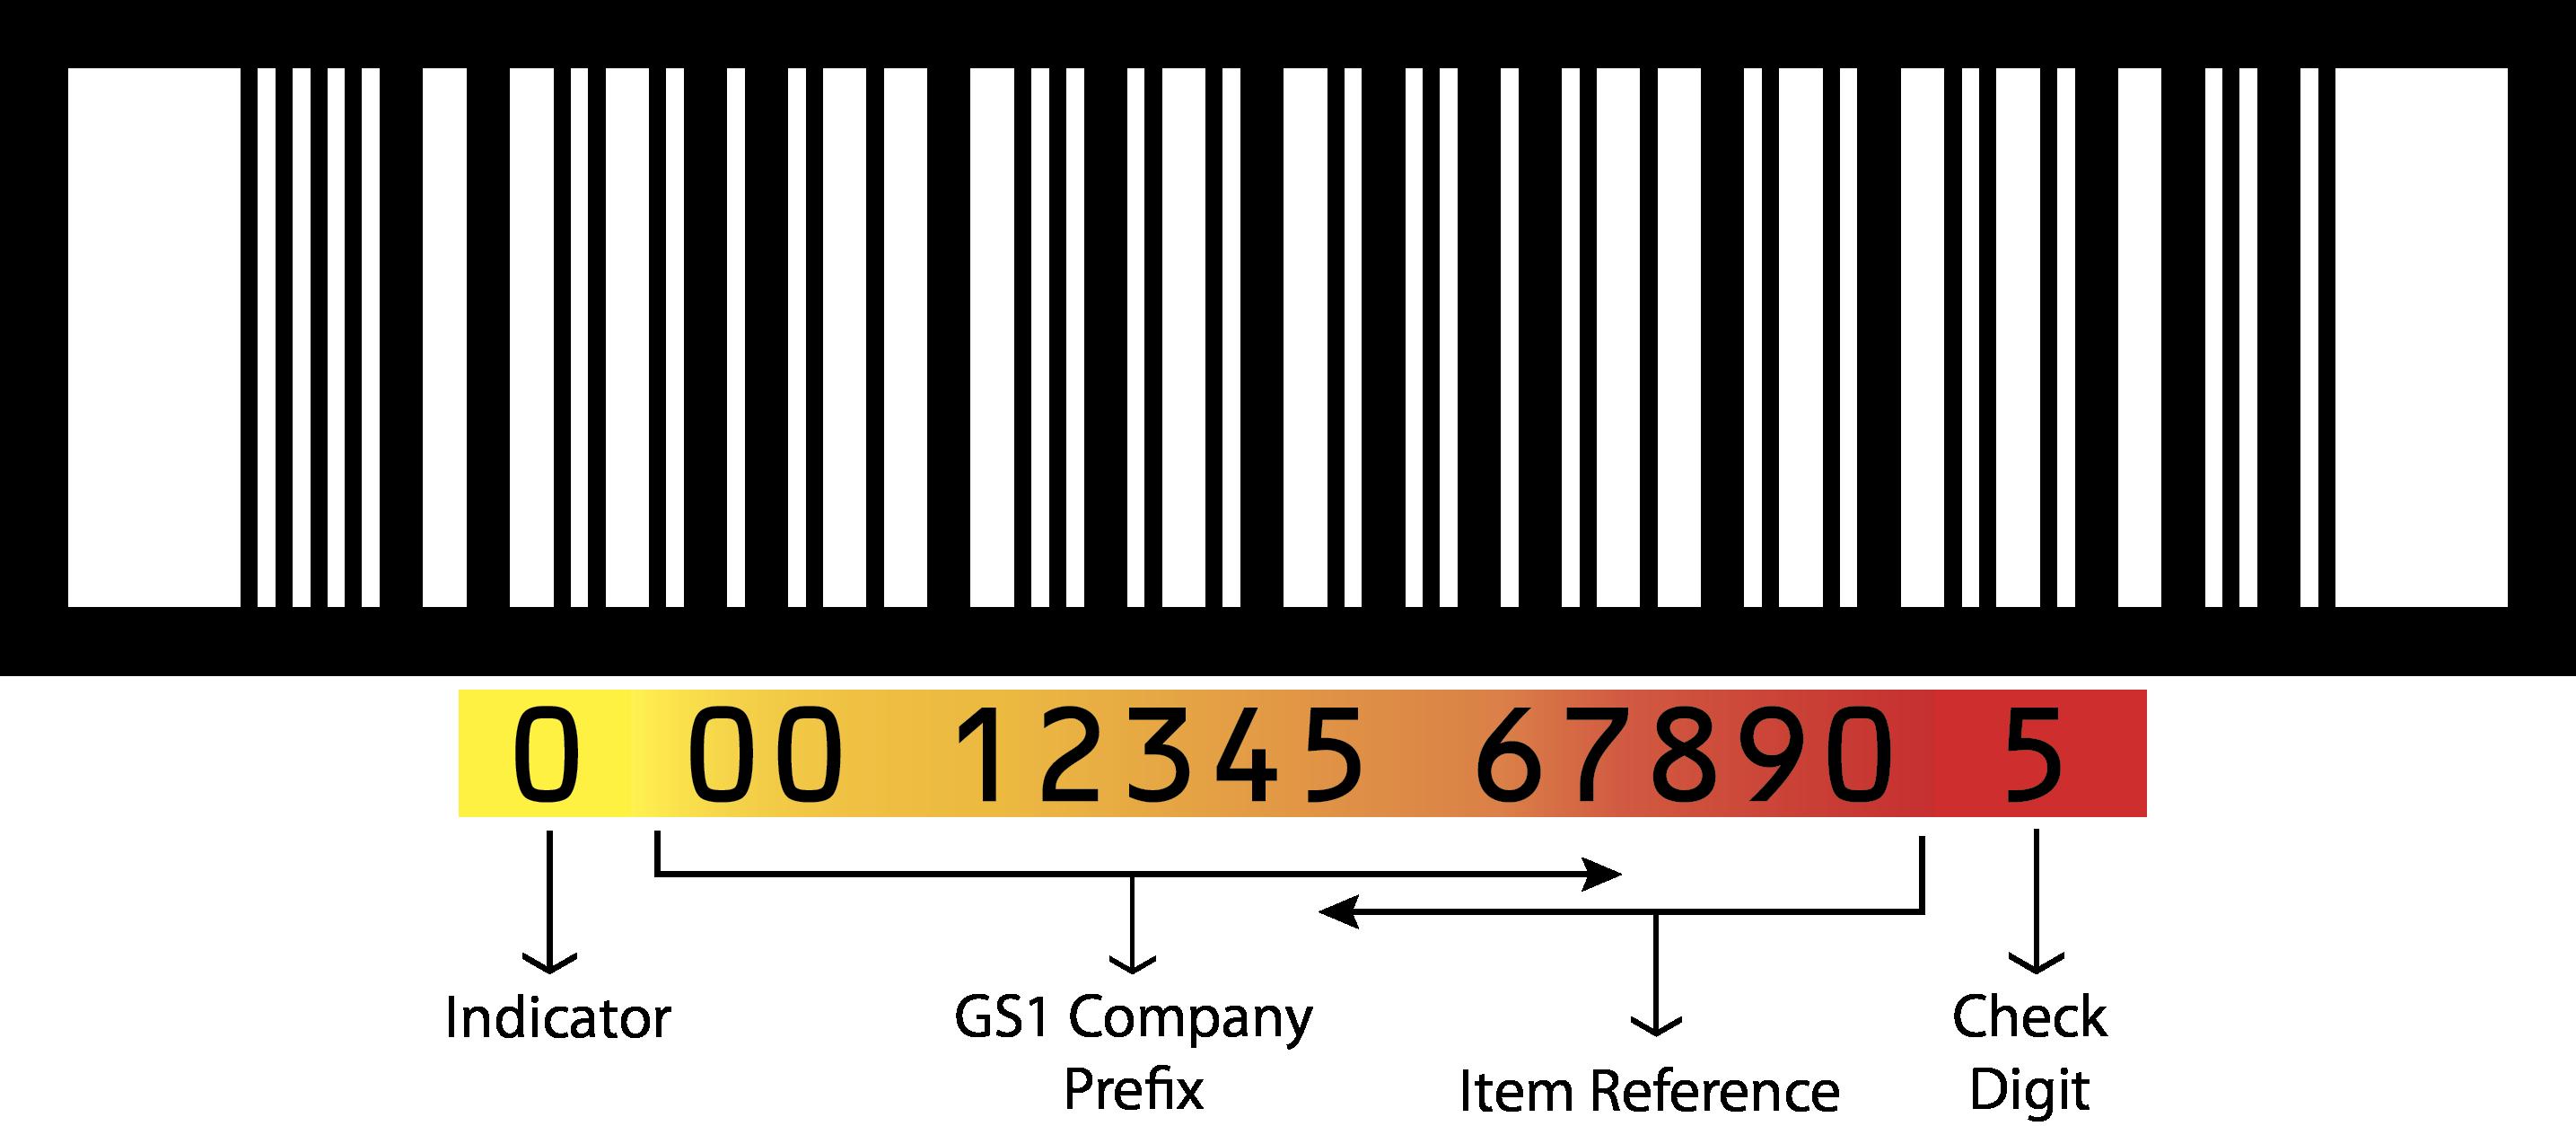 ITF-14 Barcodes - GTIN INFOGTIN INFO